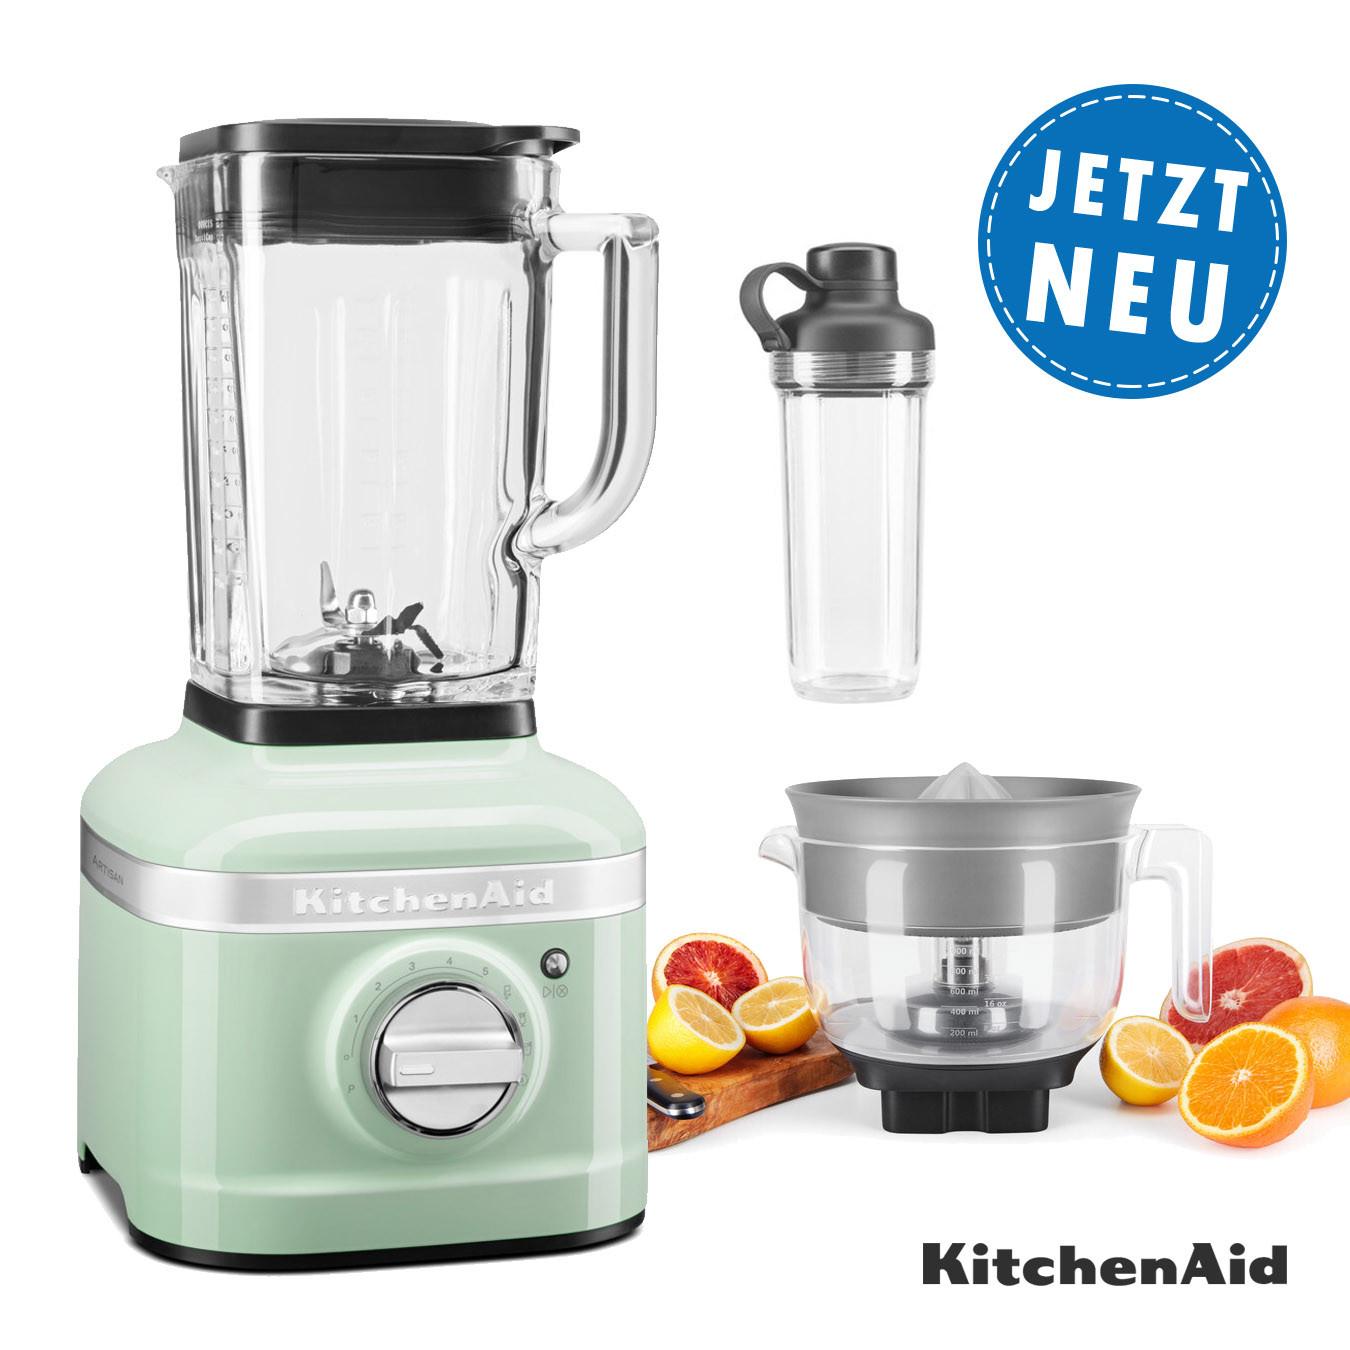 KitchenAid ARTISAN K400 Standmixer 5KSB4026EPT mit Zitrusaufsatz